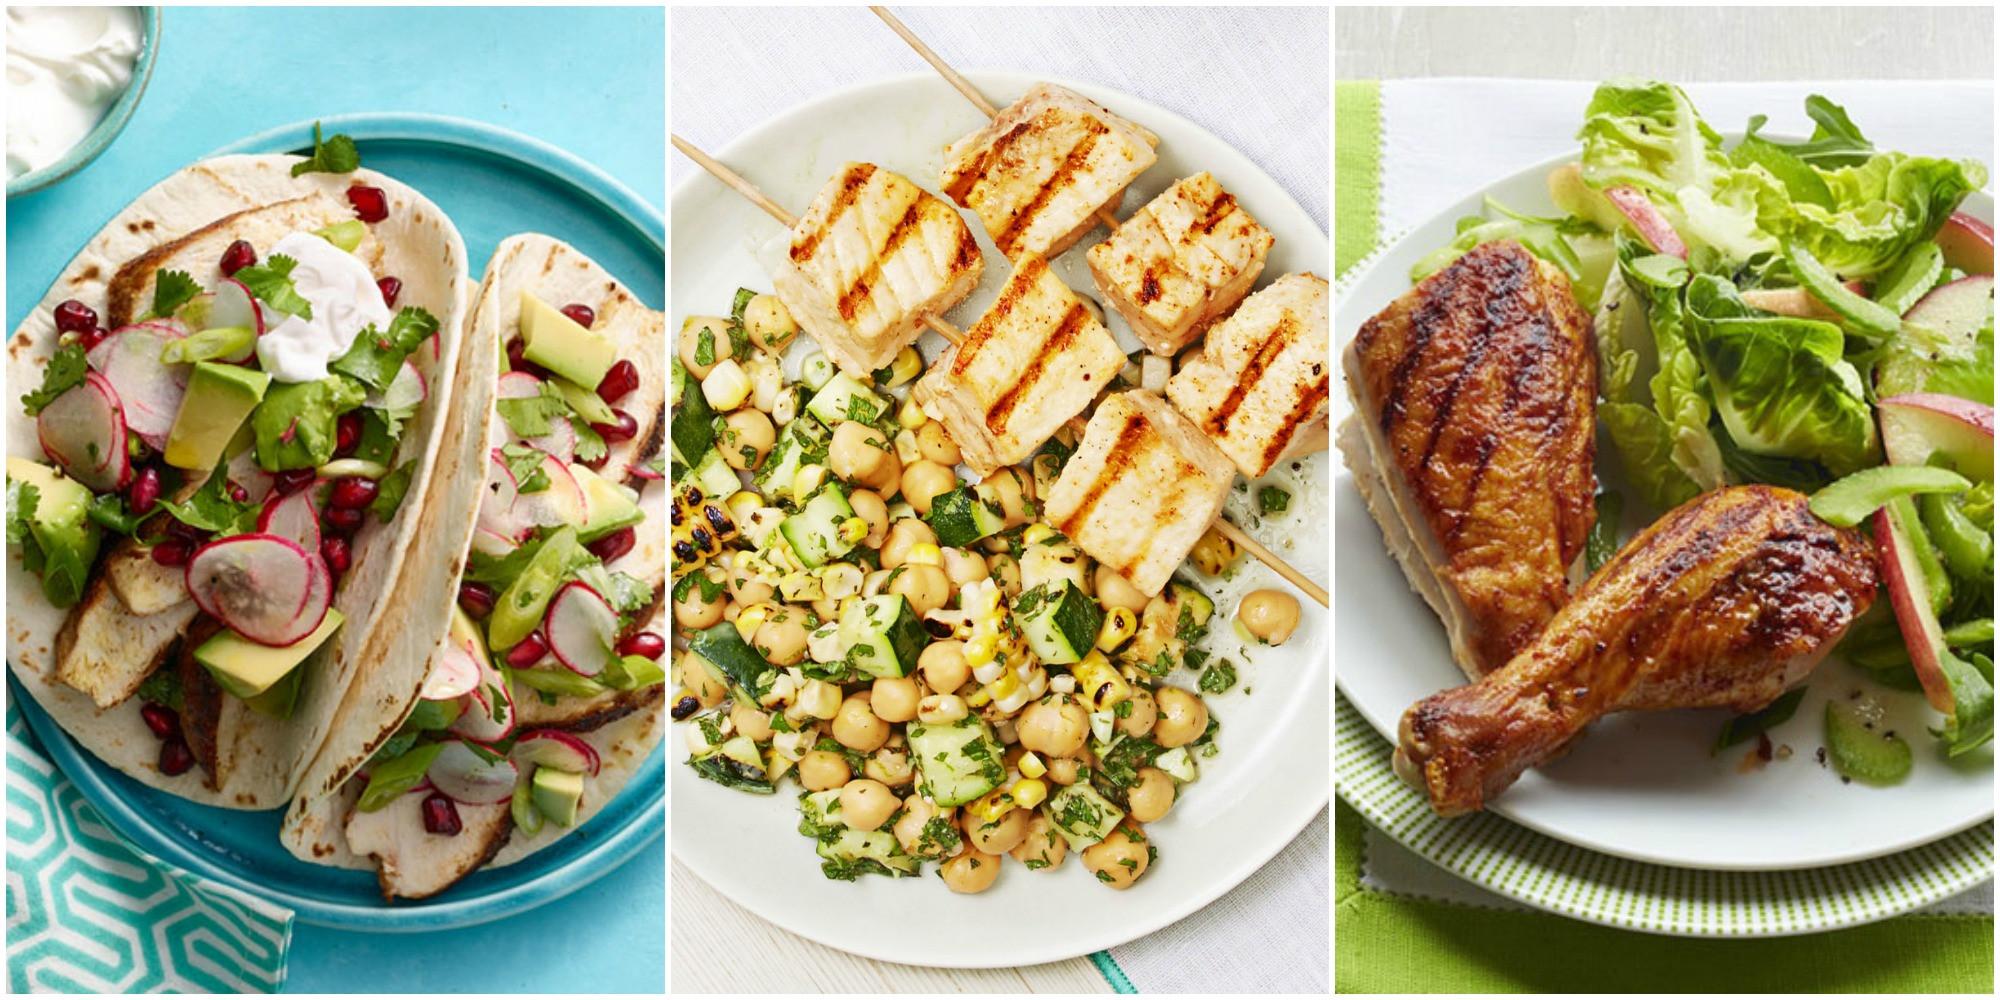 Summer Recipes Dinner  60 Best Summer Dinner Recipes Quick and Easy Summer Meal